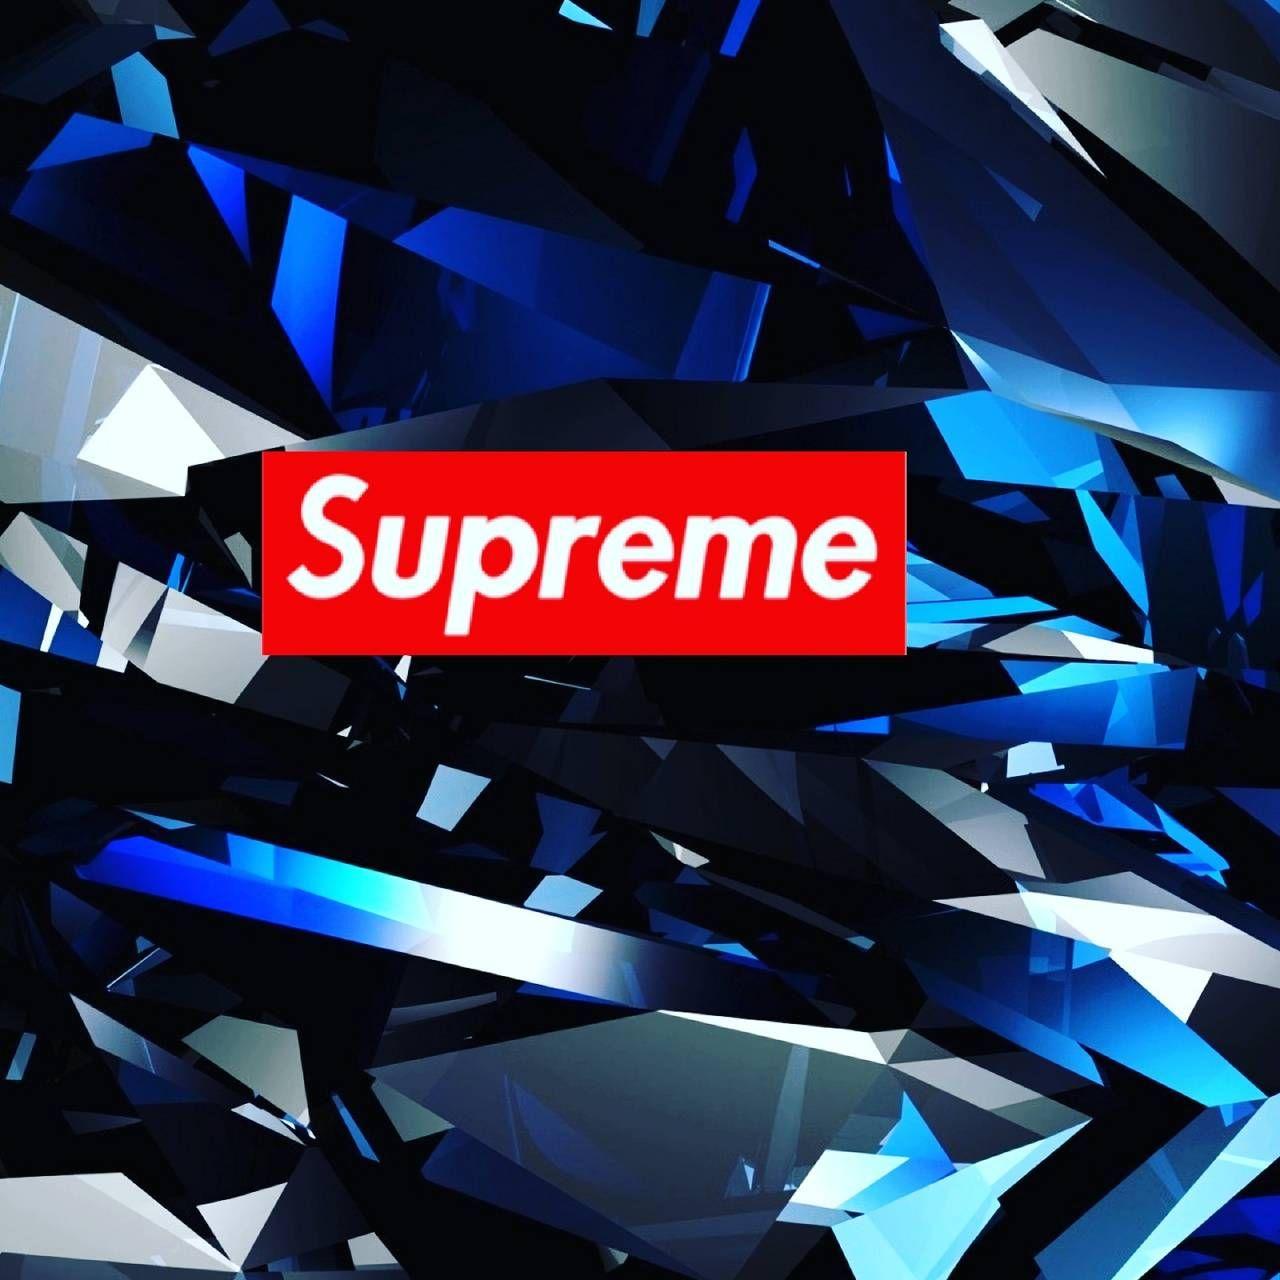 Supreme Wallpaper 11 1280 X 1280 Stmed Net In 2020 Supreme Wallpaper Supreme Background Neon Wallpaper